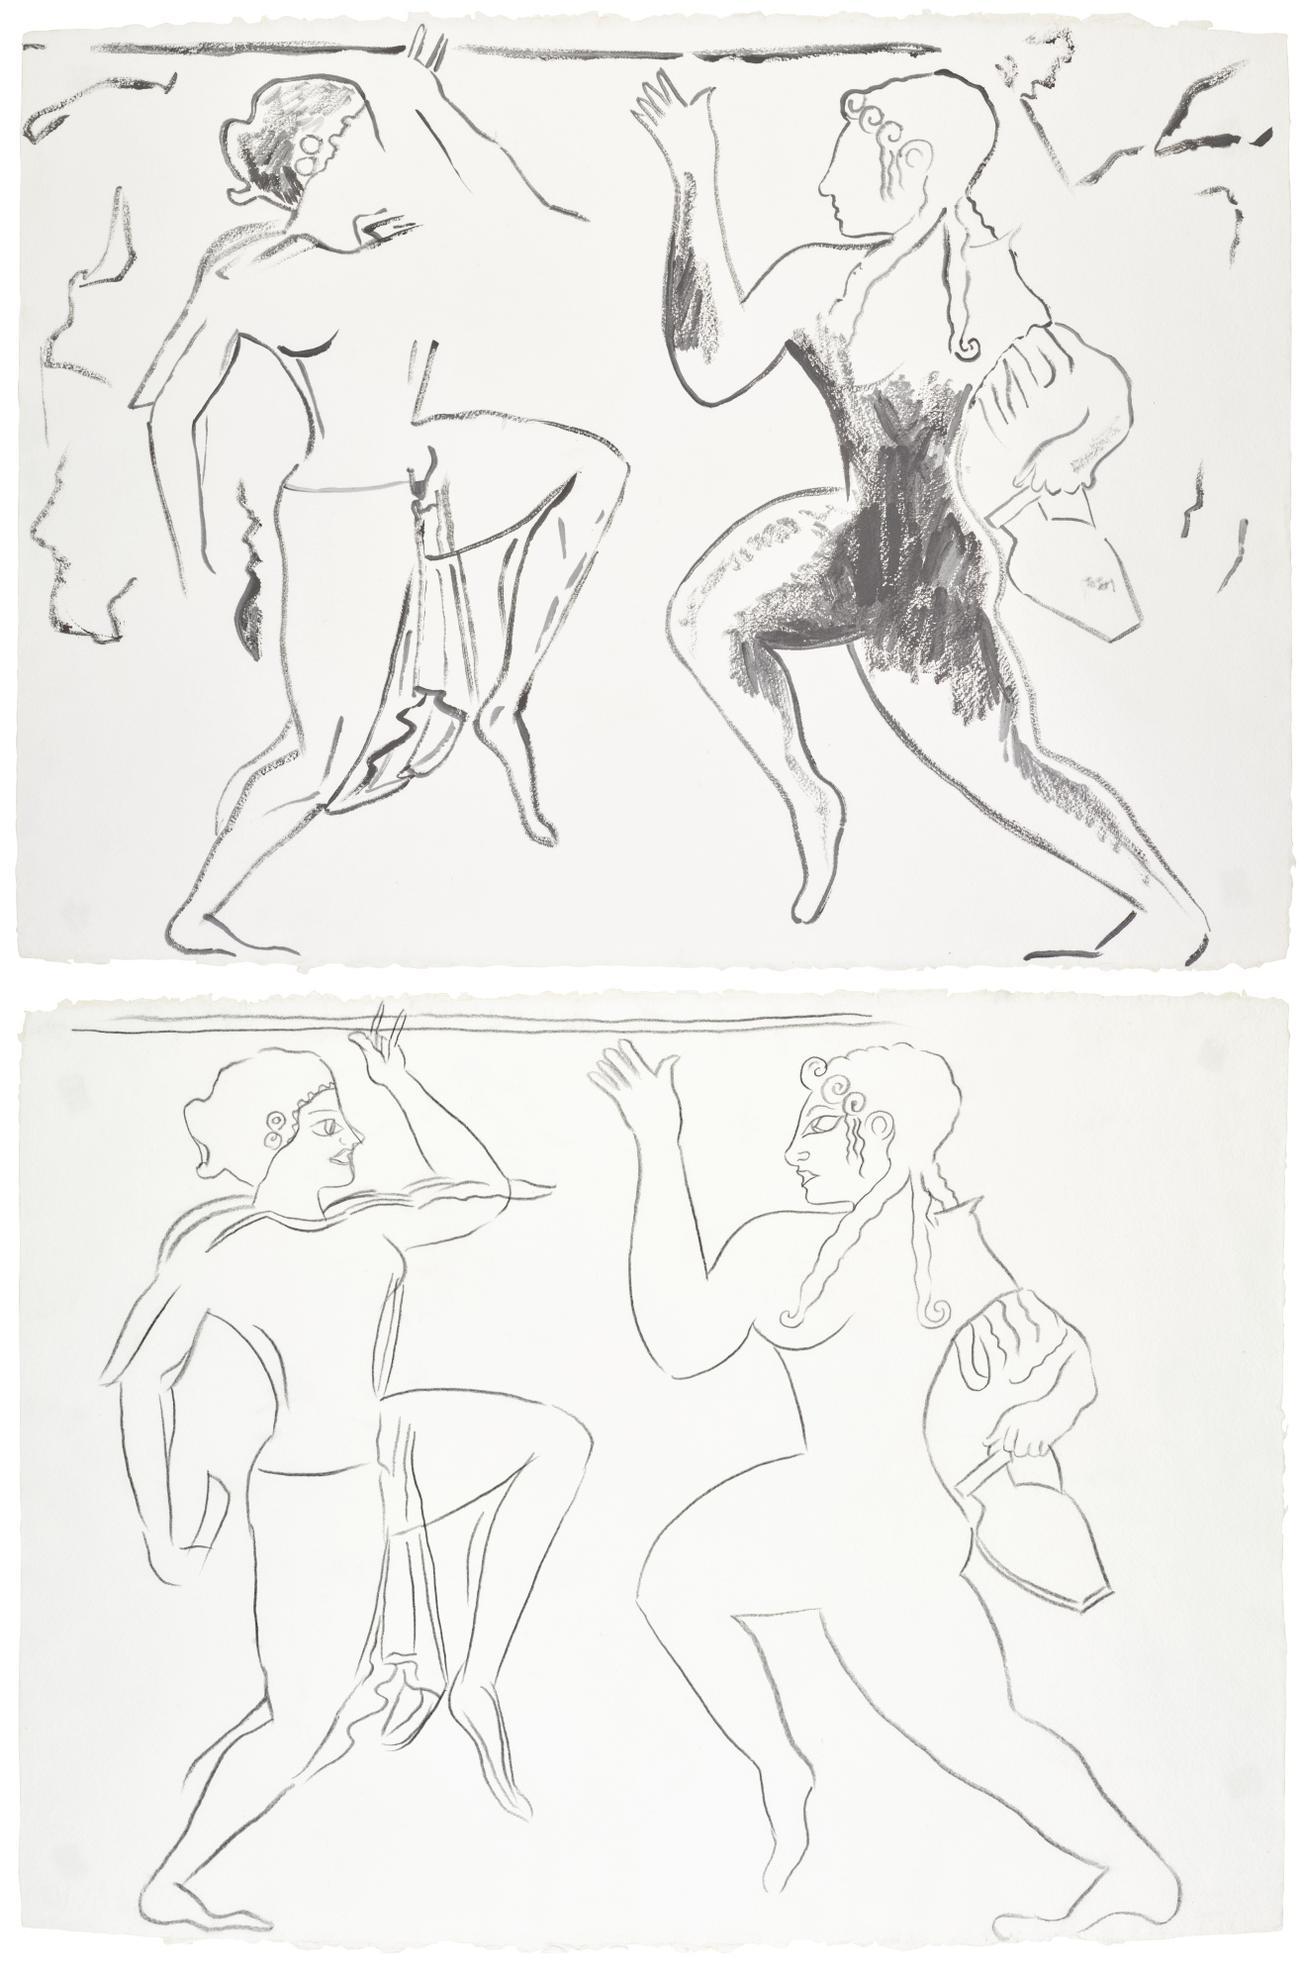 Andy Warhol-The Etruscan Scene: Female Ritual Dance I And Ii-1985